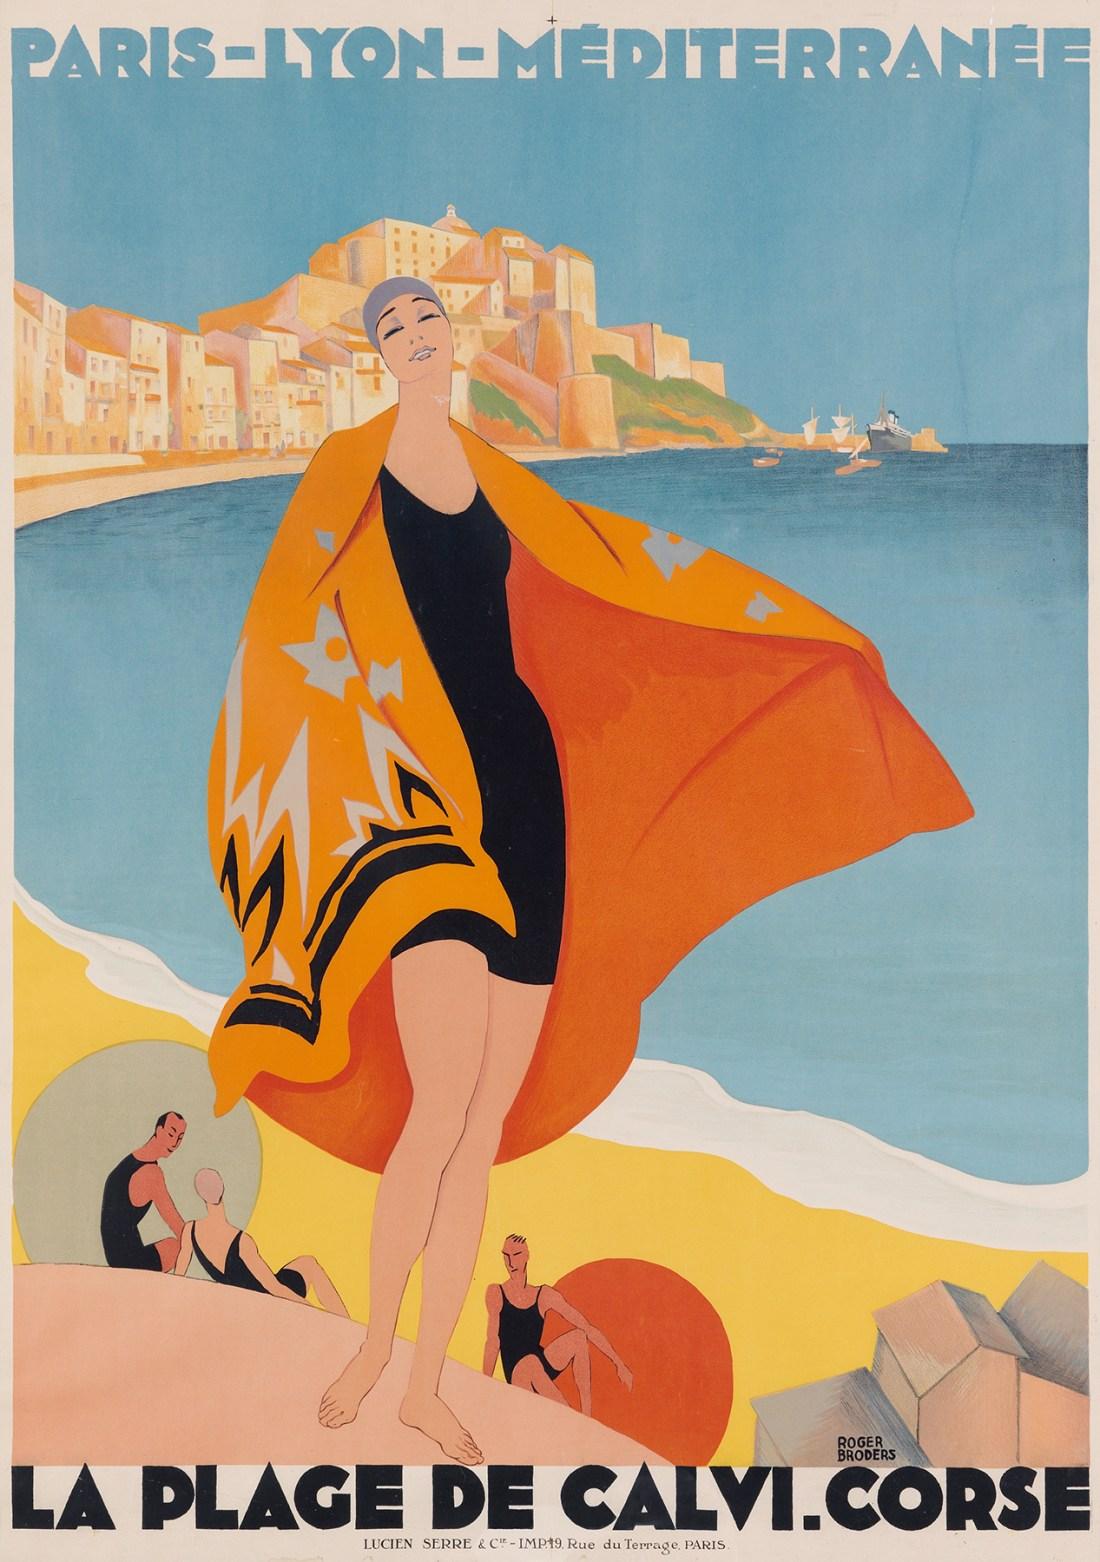 La Place de Calvi. Corse, a 1928 poster by Roger Broders, touting Calvi Beach on the Mediterranean island of Corsica.